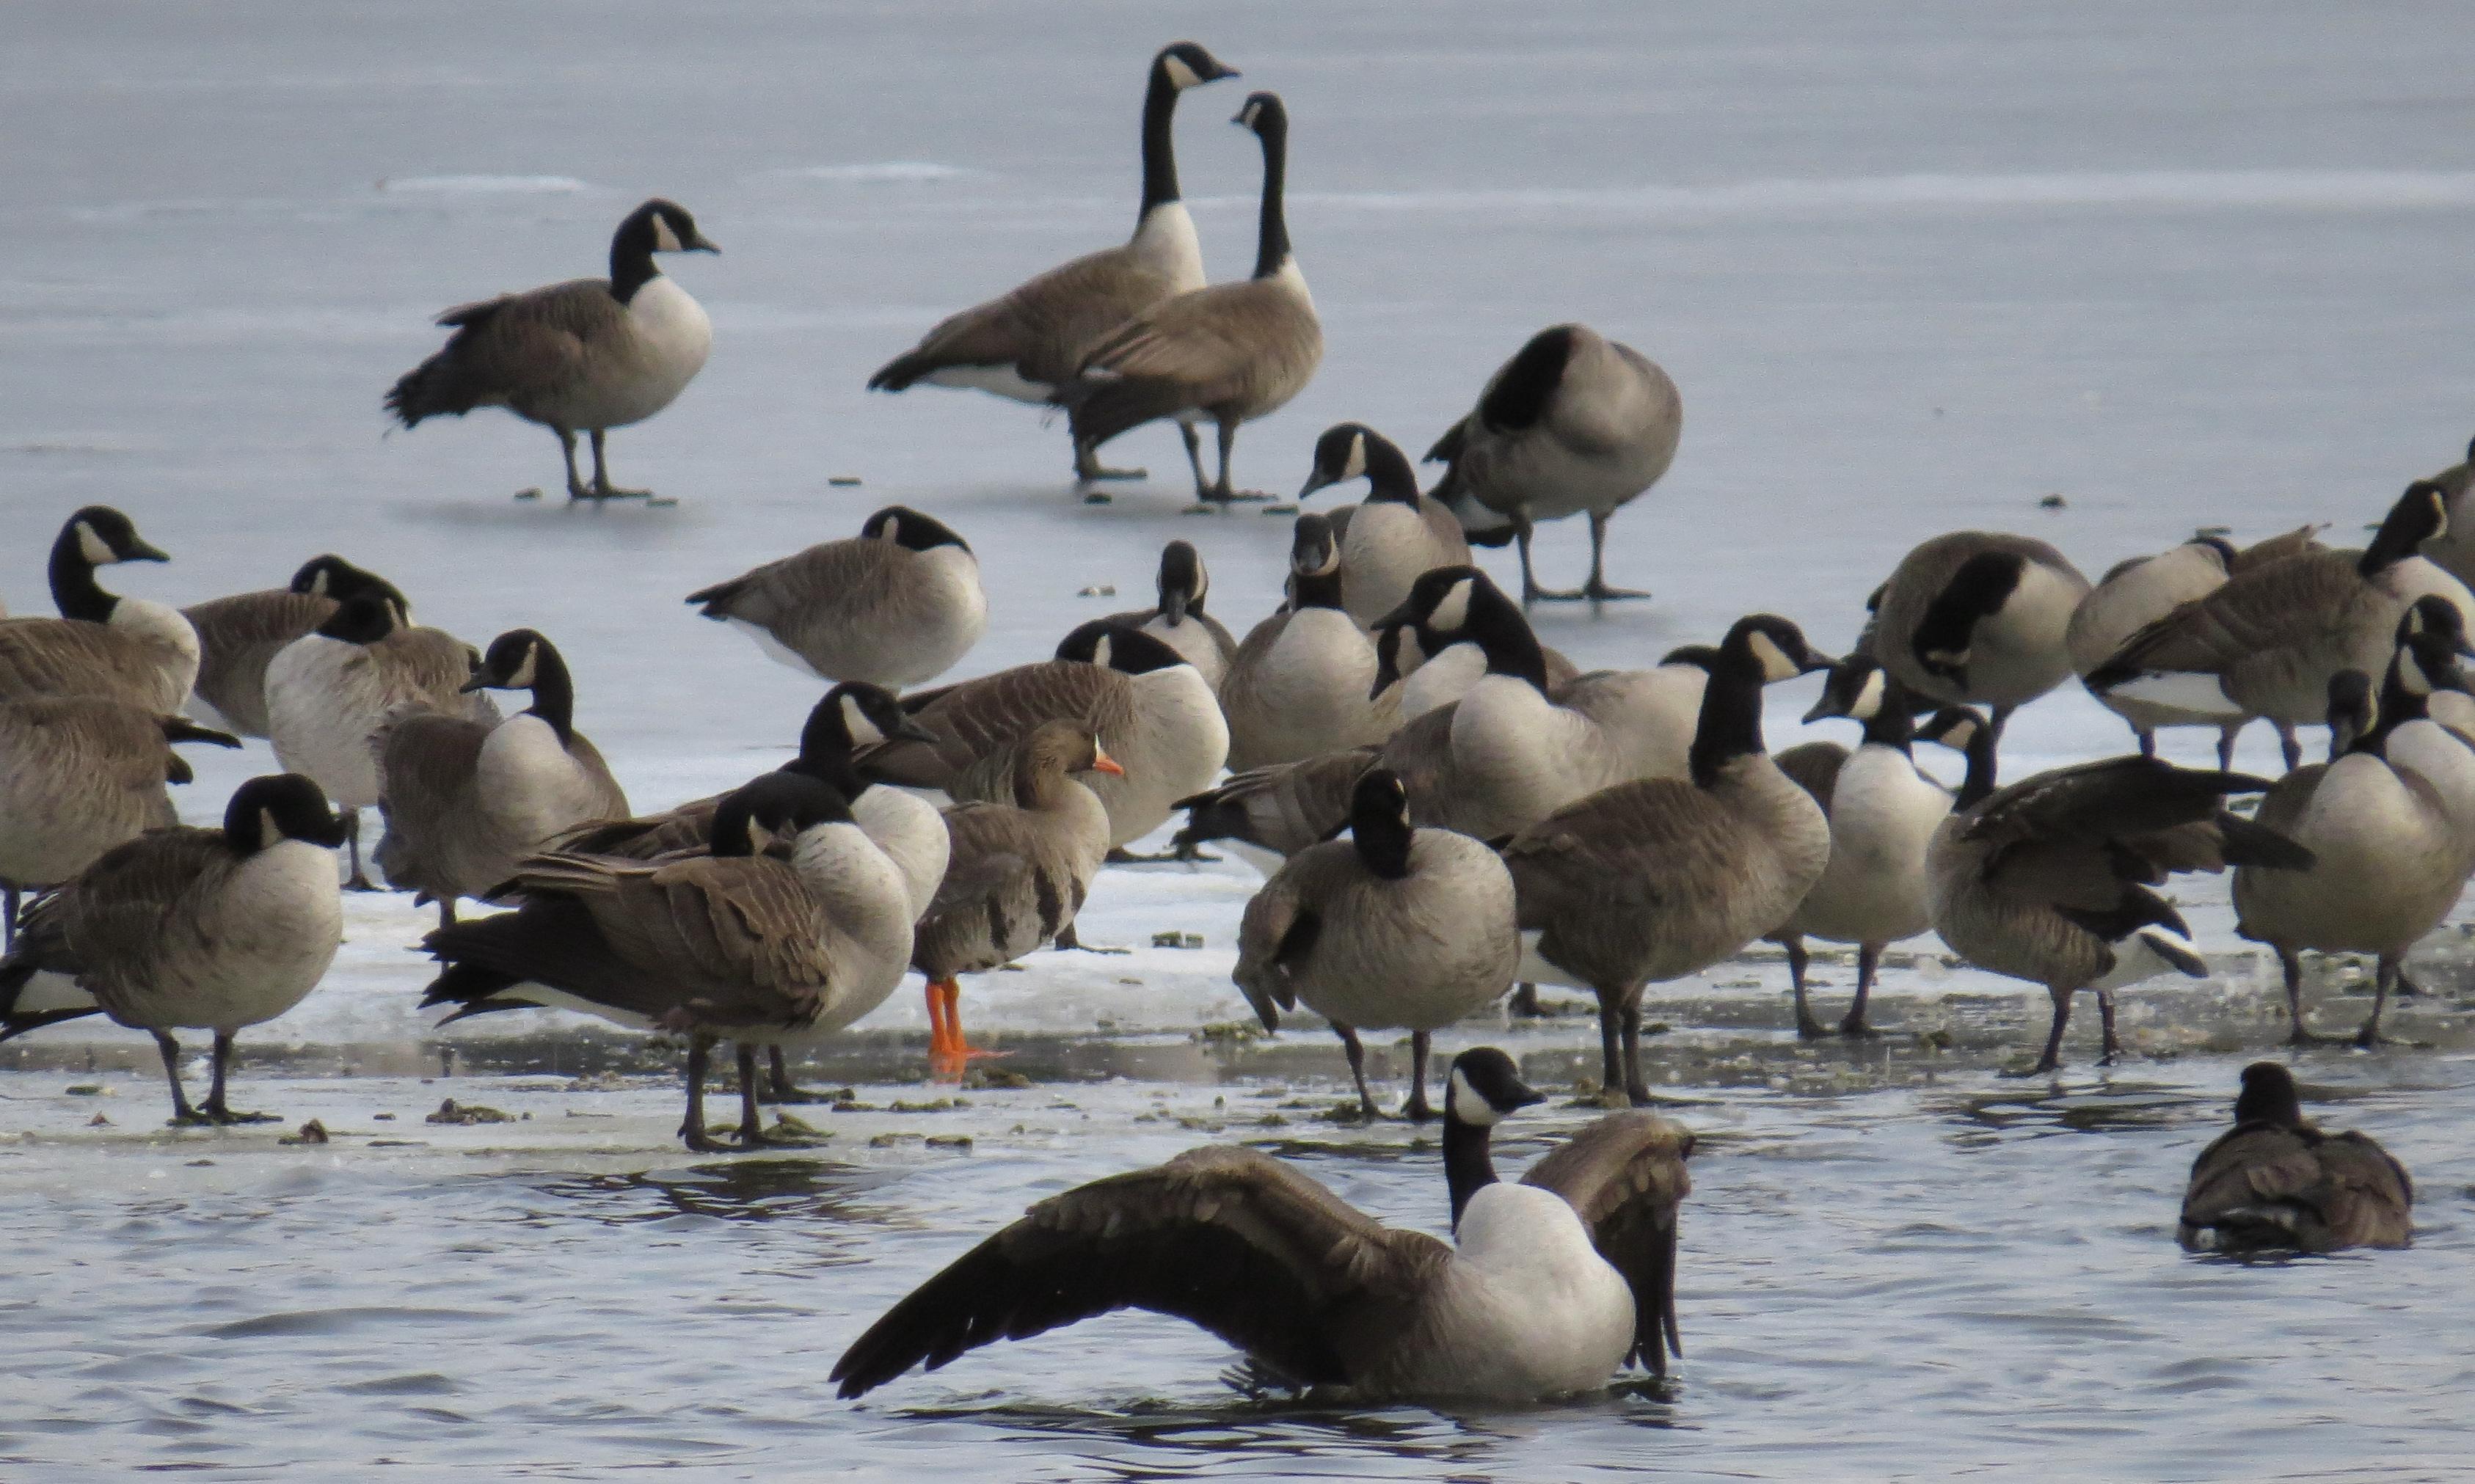 canada goose discounts to hershey